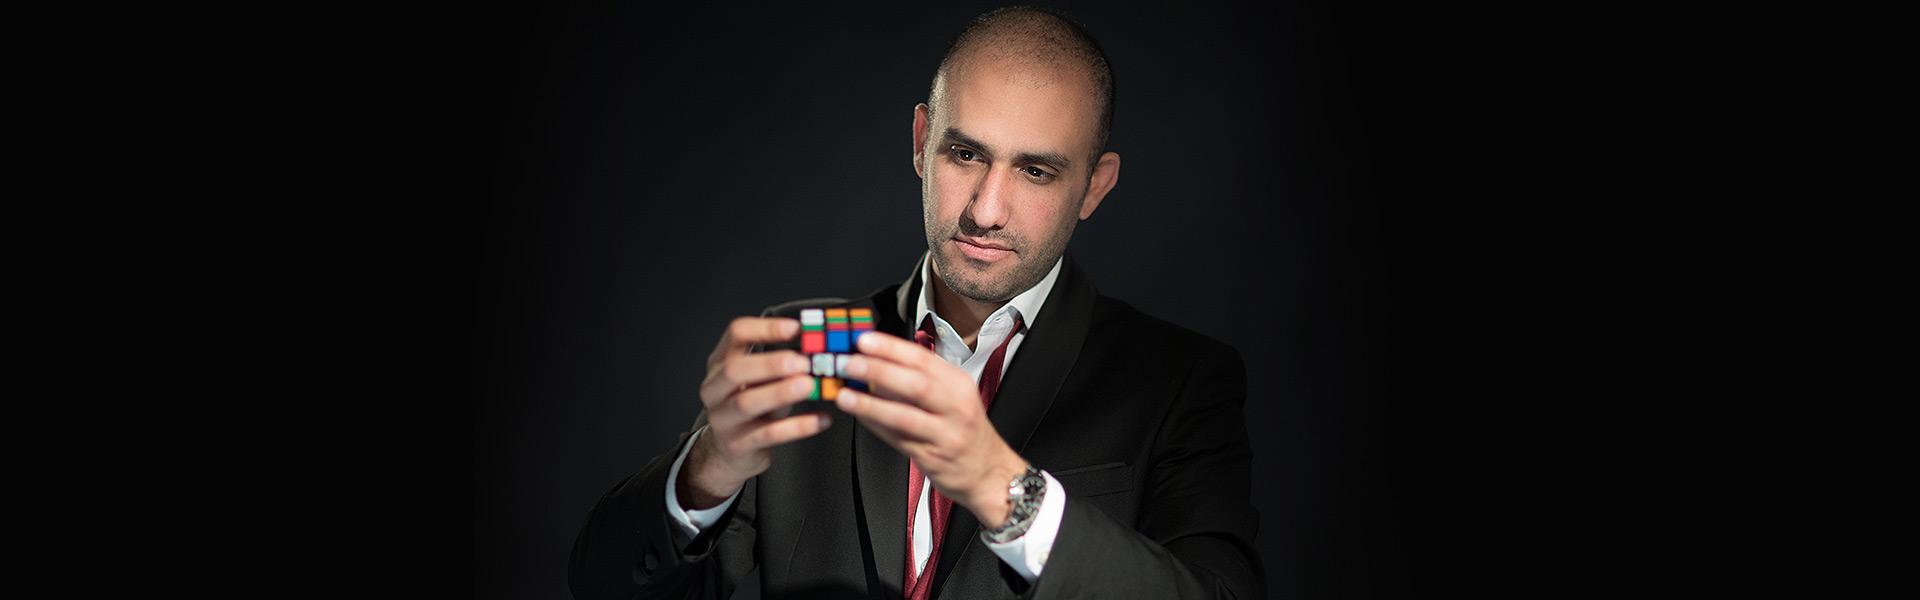 Yoan Tanuji Mentaliste professionnel